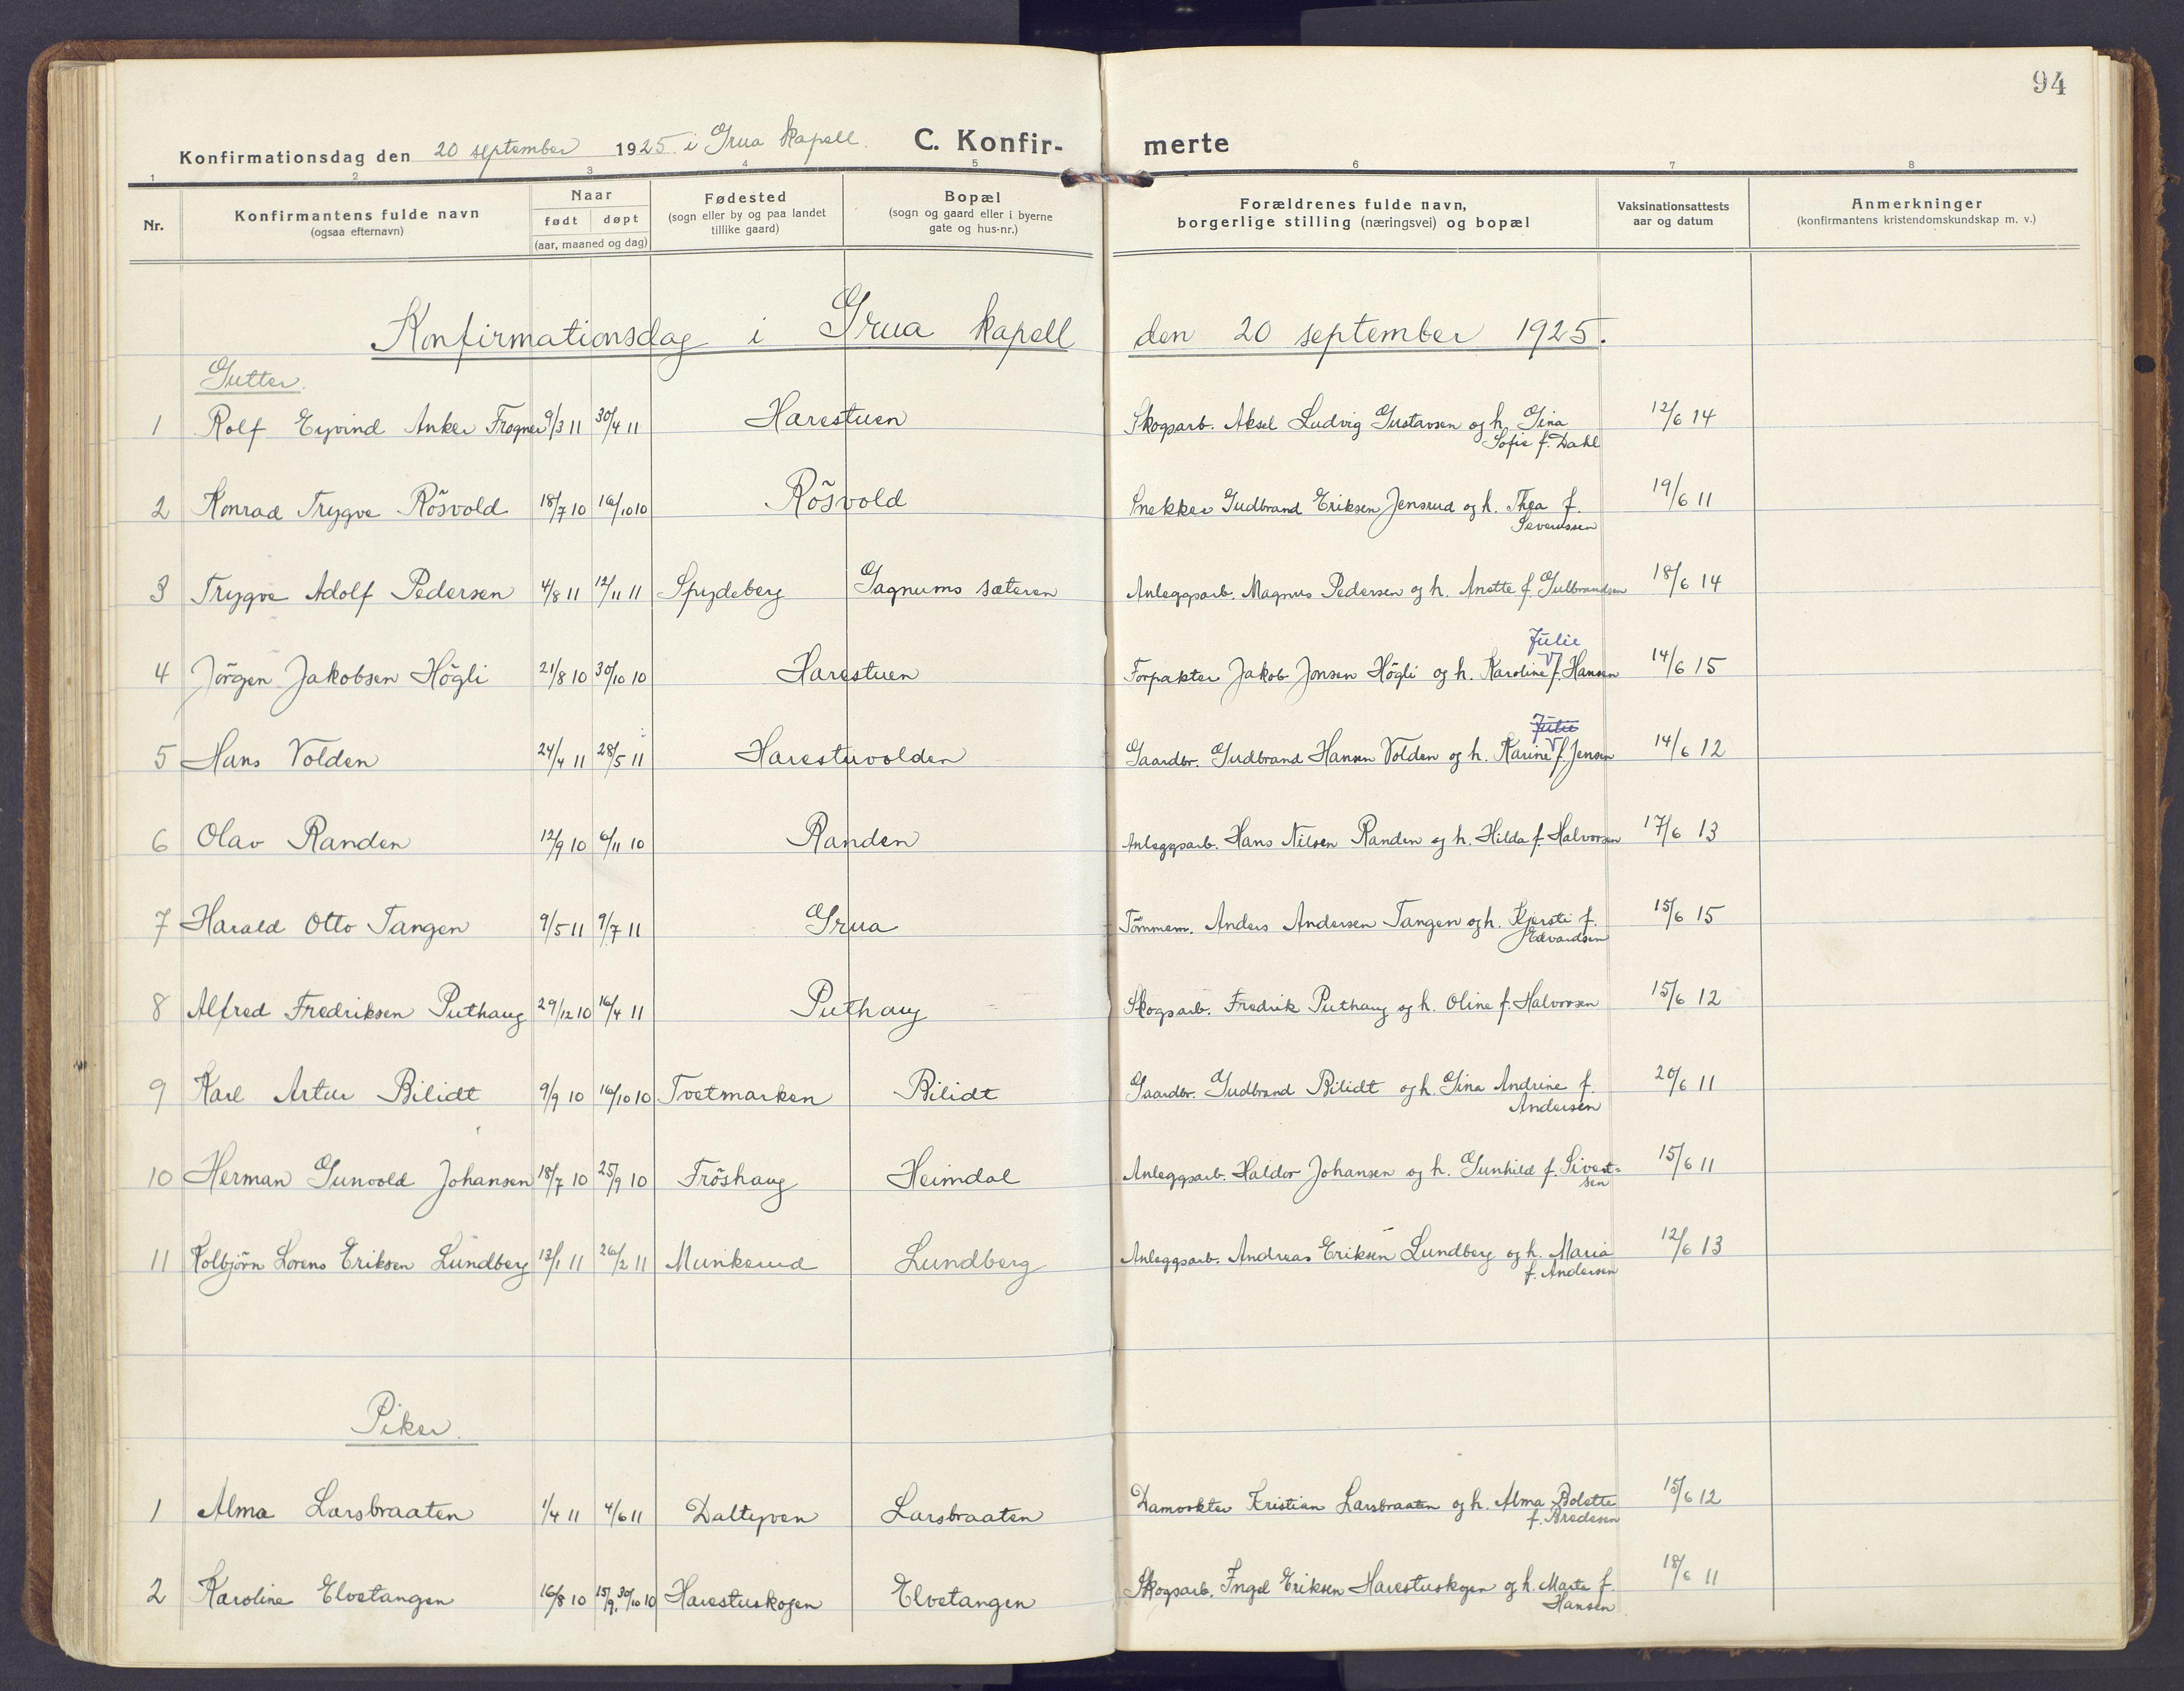 SAH, Lunner prestekontor, H/Ha/Haa/L0002: Ministerialbok nr. 2, 1922-1931, s. 94